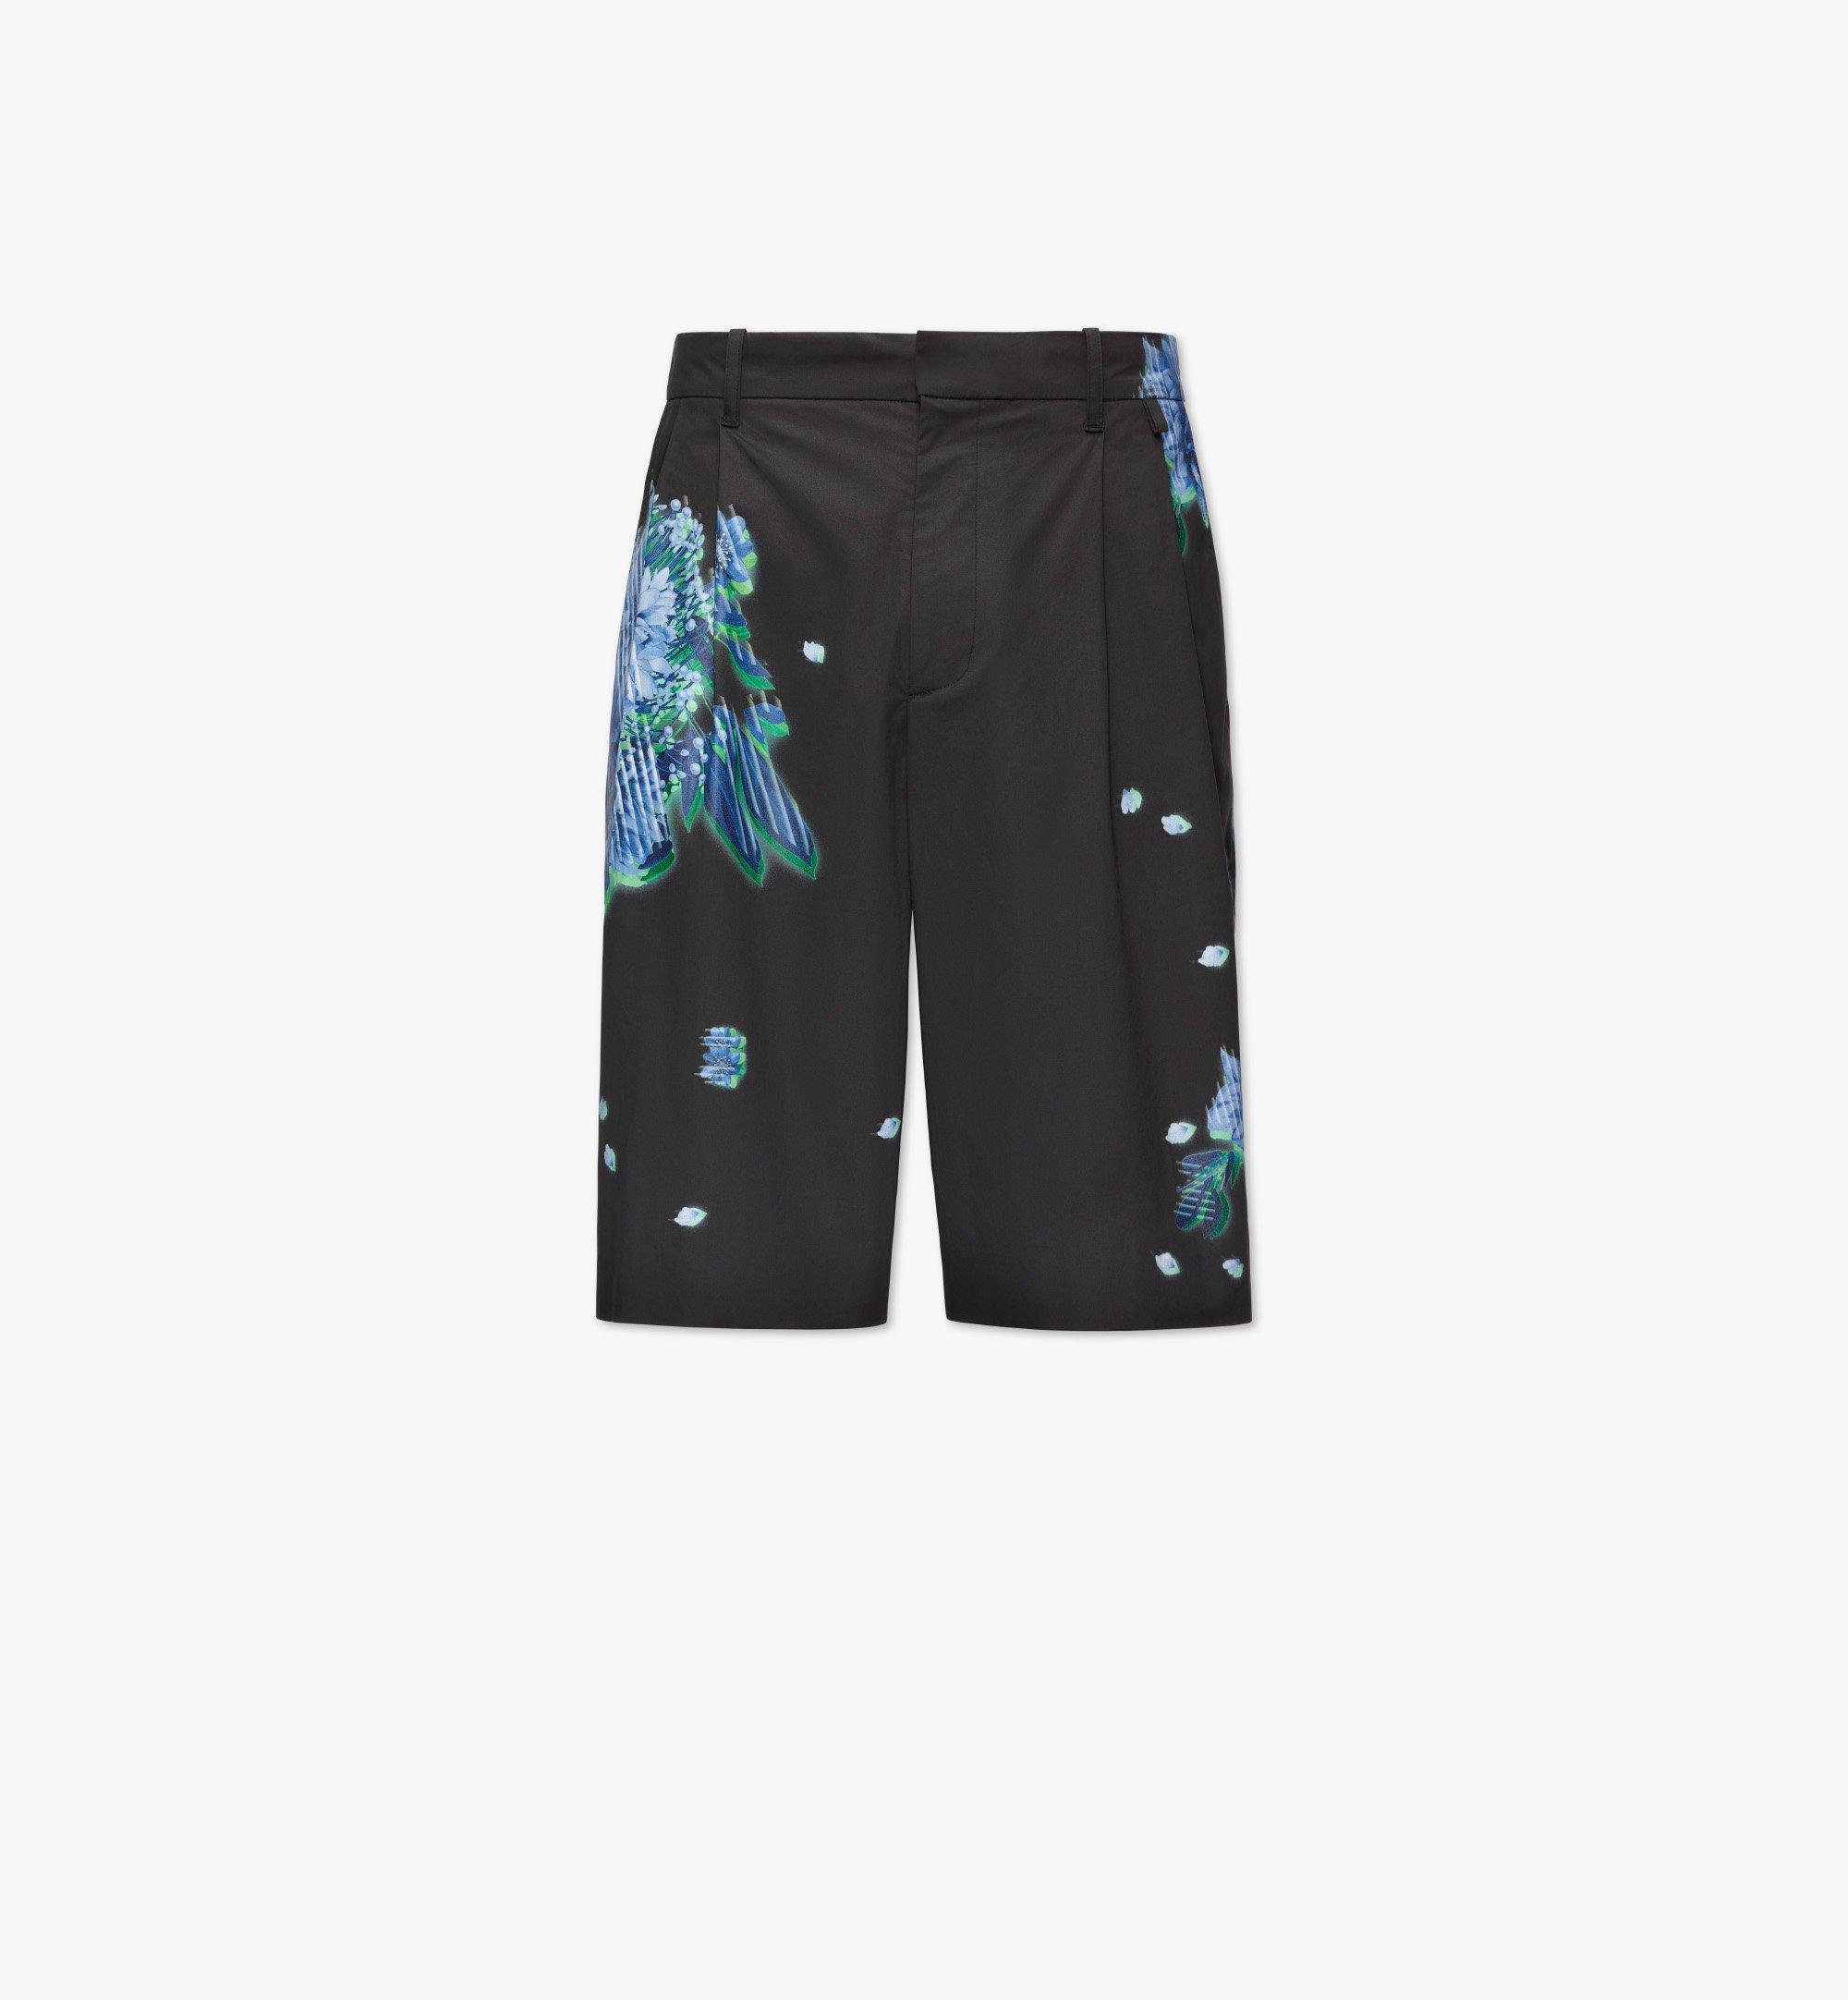 MCM Men's Tech Flower Print Shorts Black MHPBSMM01B2048 Alternate View 1